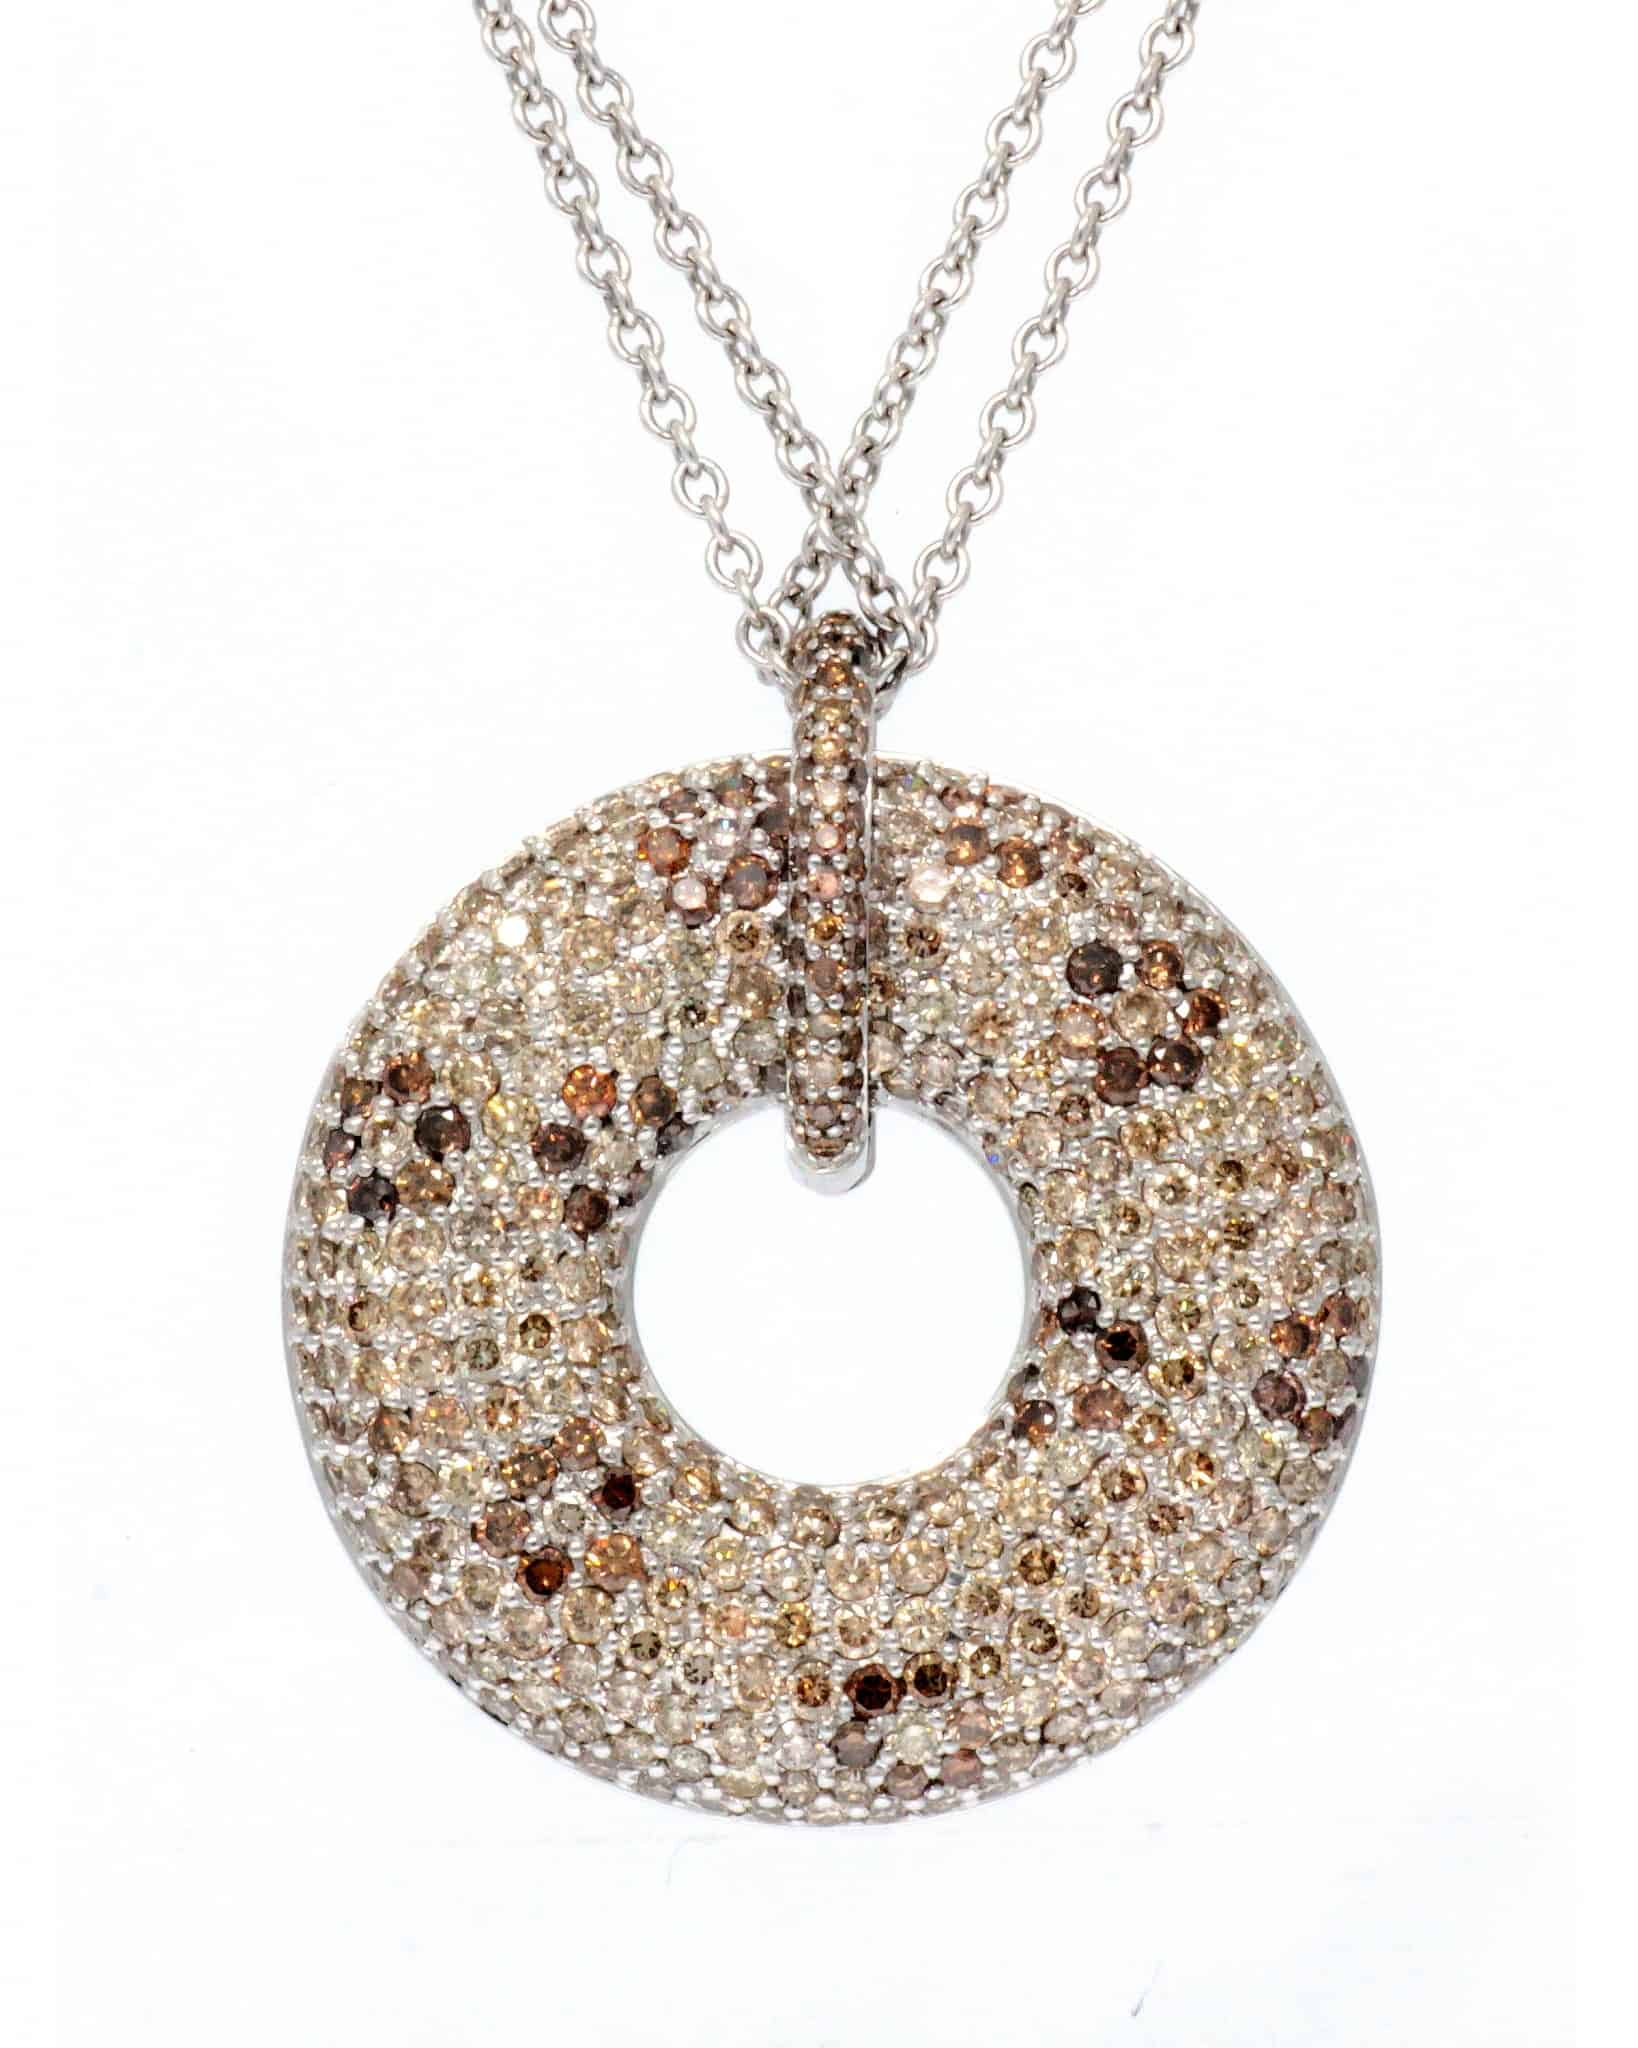 ROBERTO COIN 18K White Gold Diamond Donut Double Strand Necklace 888094AWCHBD